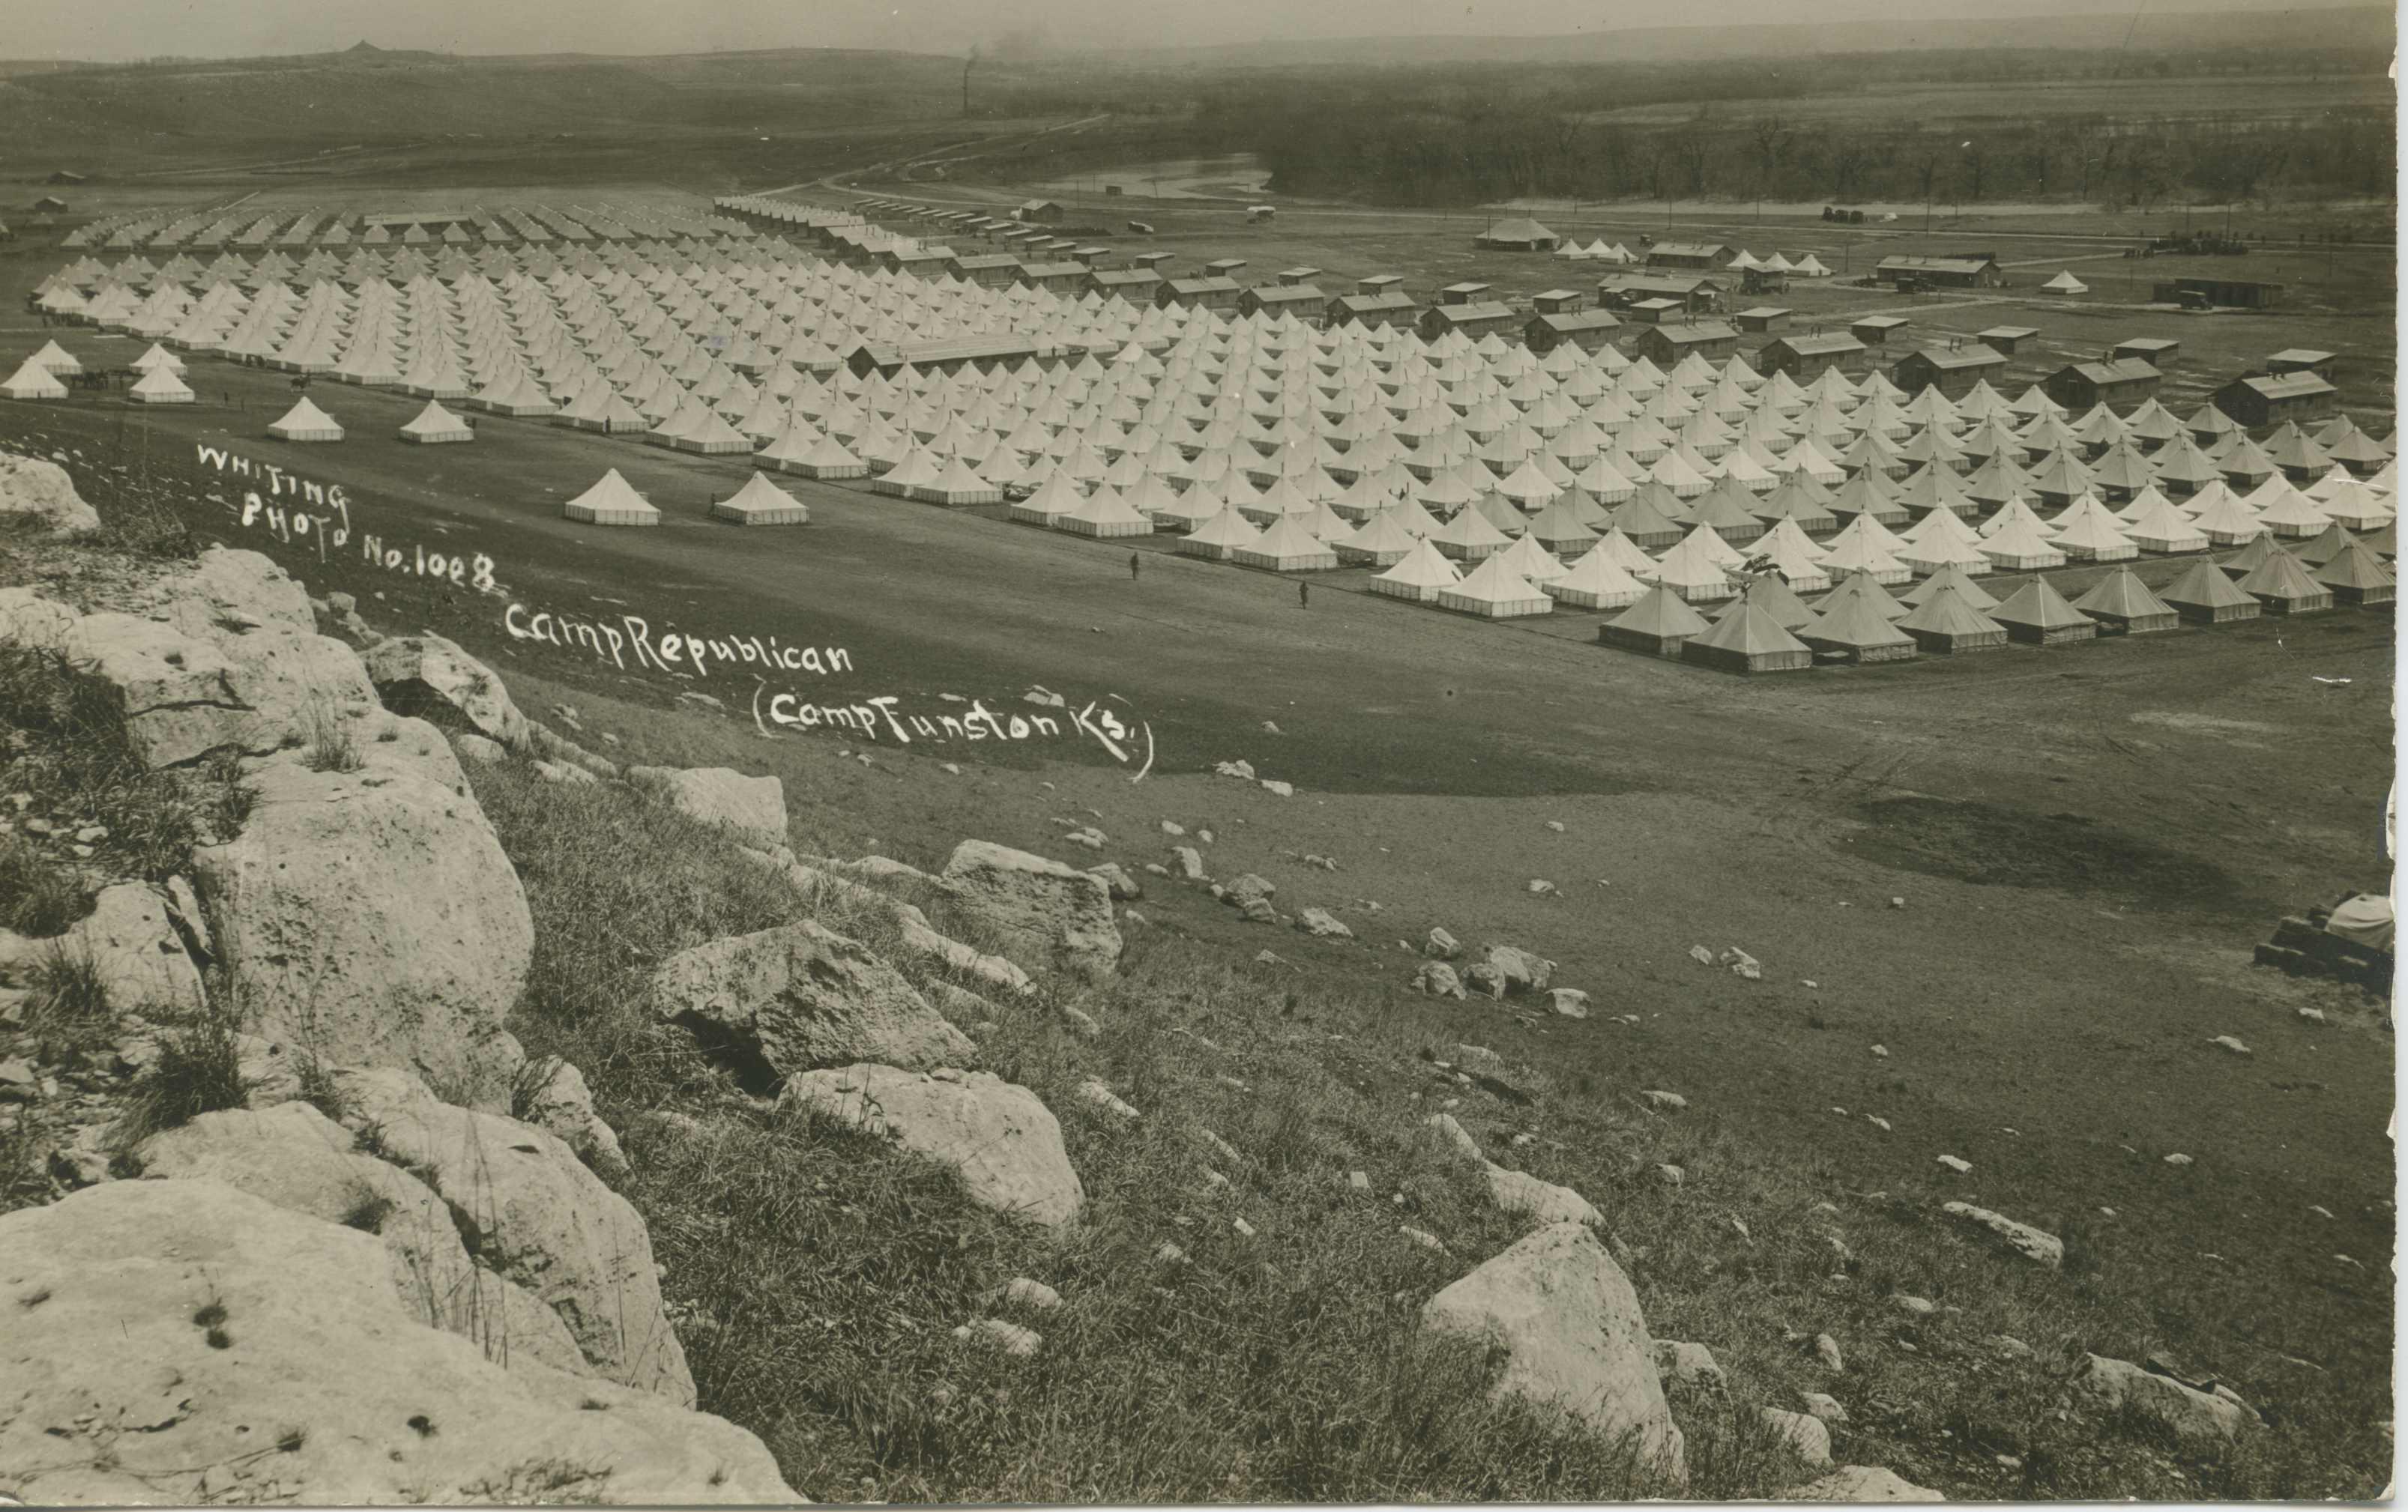 Ceremonies - Camp Funston thru Camp Lee - Camp Funston, 1918